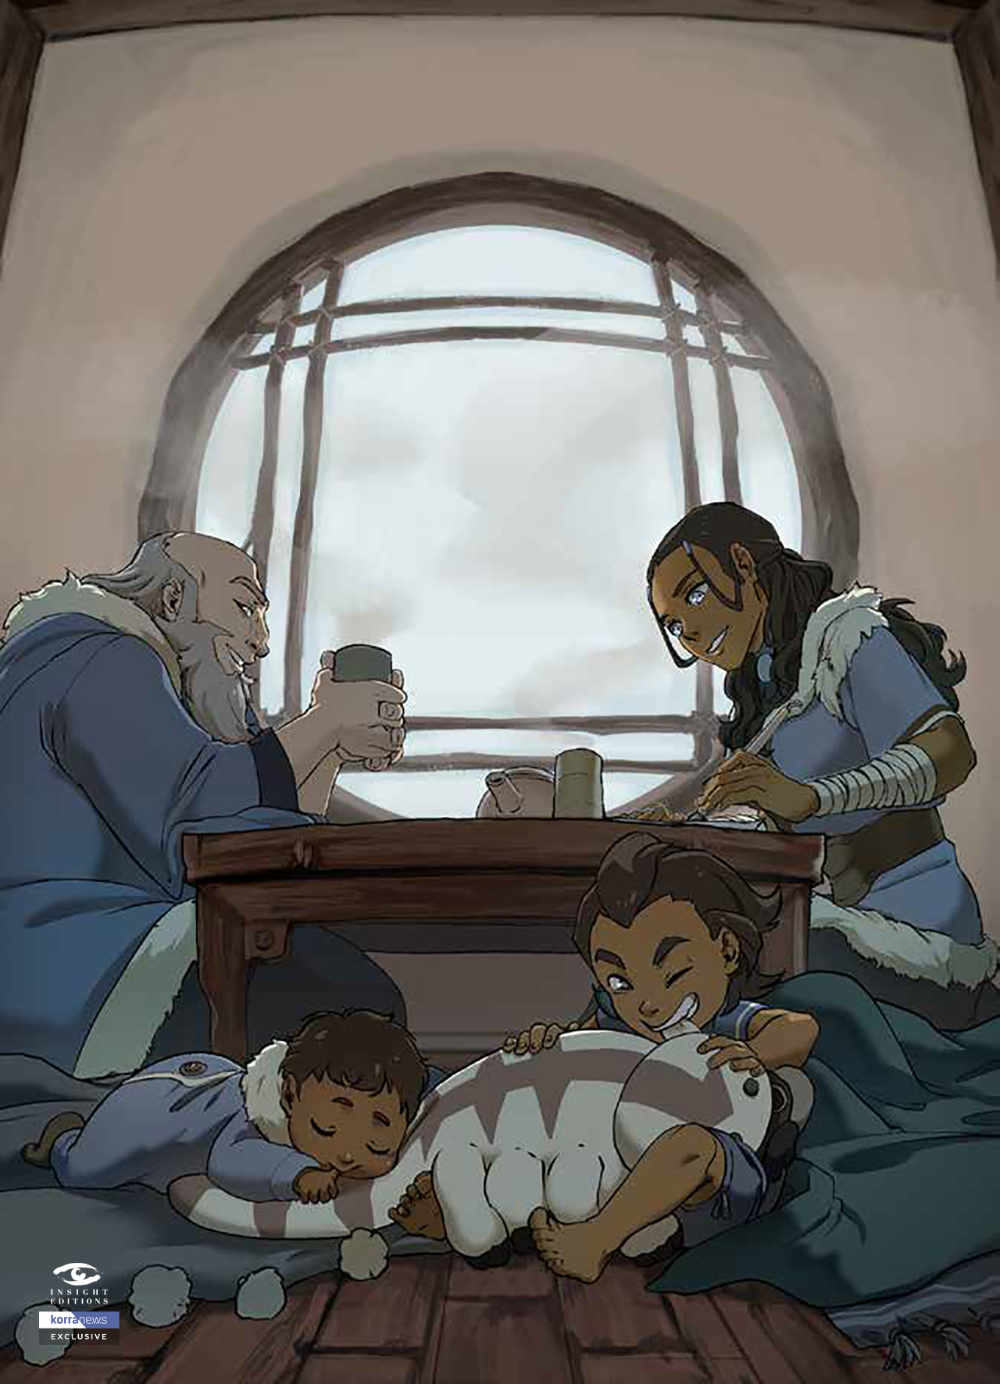 korranews - Avatar: The Last Airbender Netflix release ... The Last Airbender 2 Movie Release Date 2020